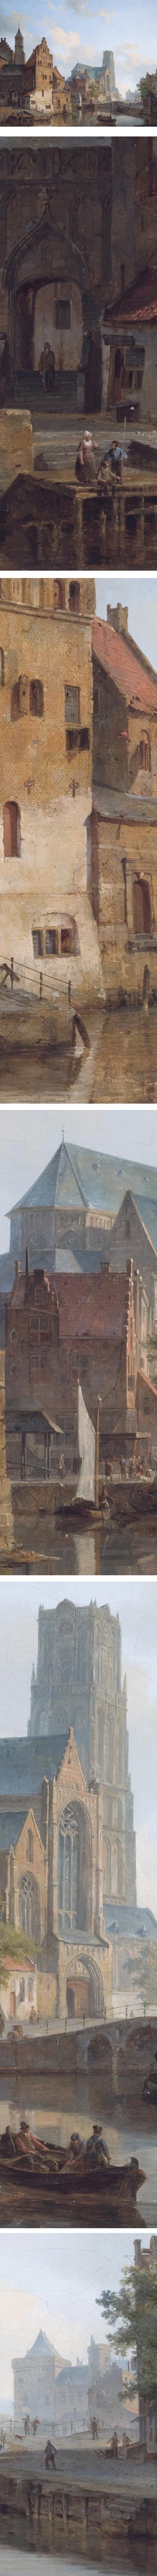 Delftse Vaart and the St Laurens church in Rotterdam,  Cornelis Springer, 19th century Dutch cityscape